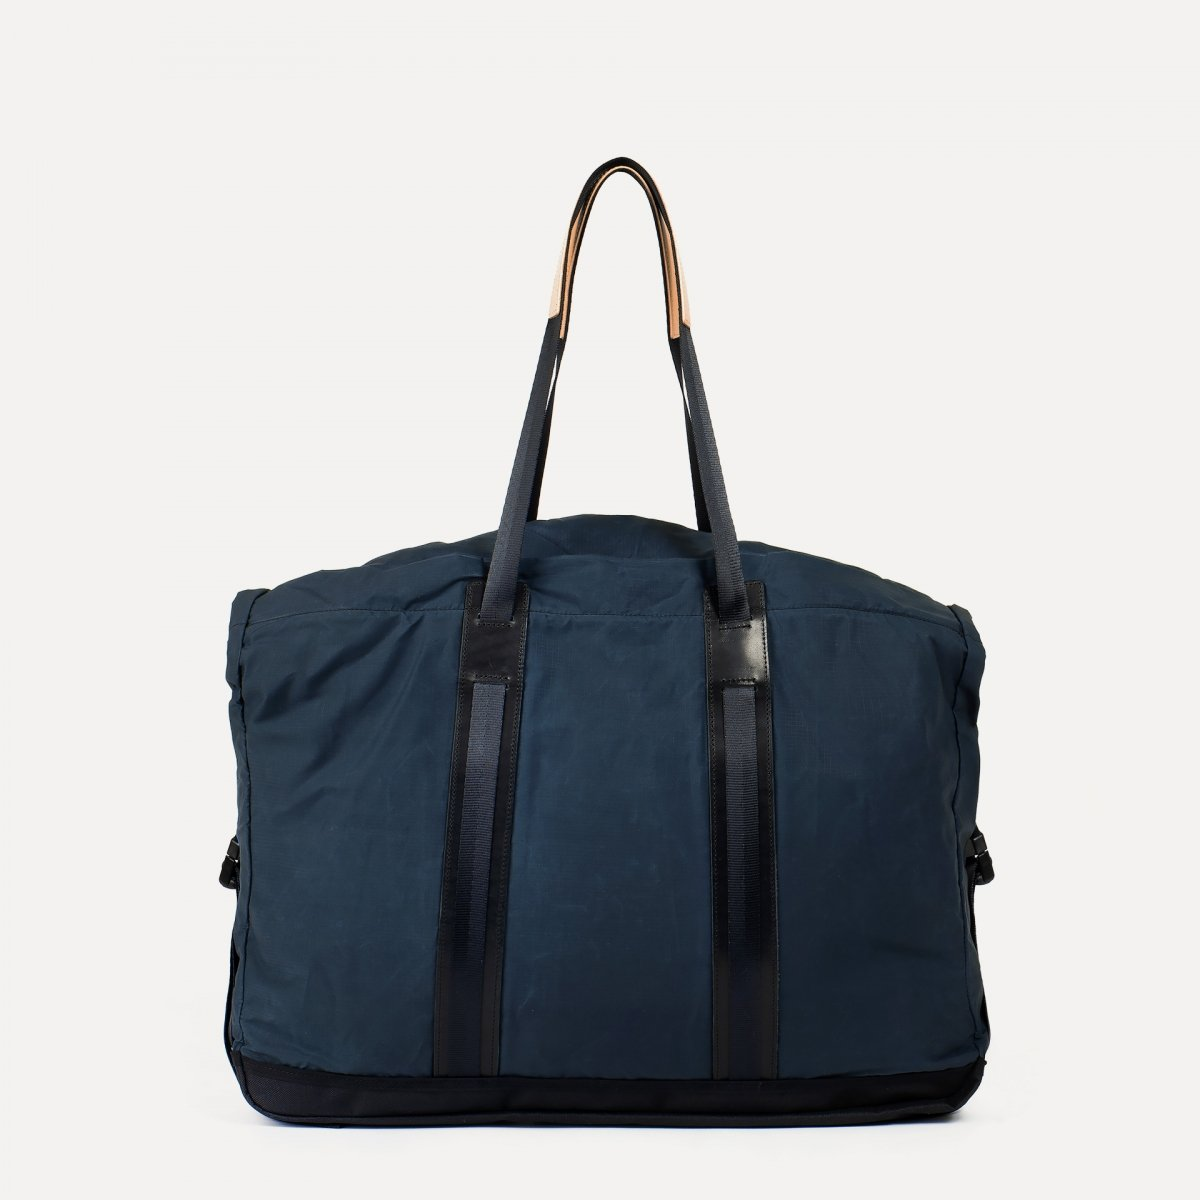 15L Barda Tote bag - Hague Blue (image n°3)